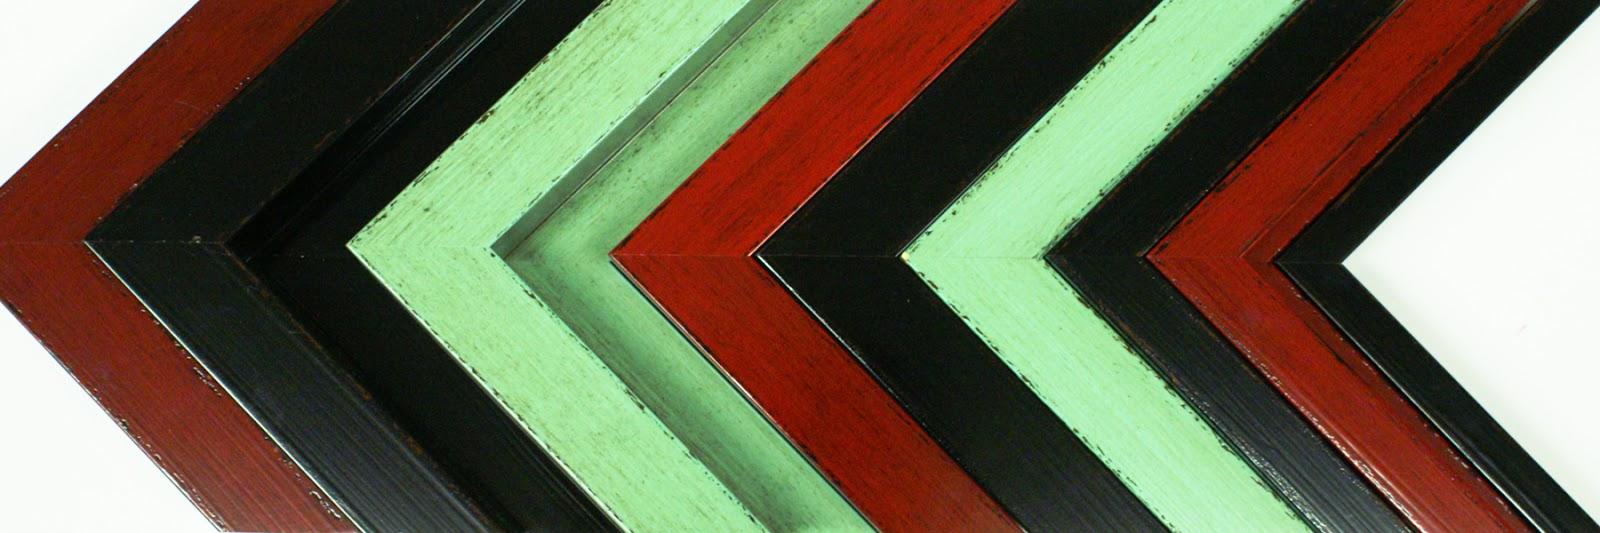 Atemberaubend Larson Juhl Picture Frames Galerie ...